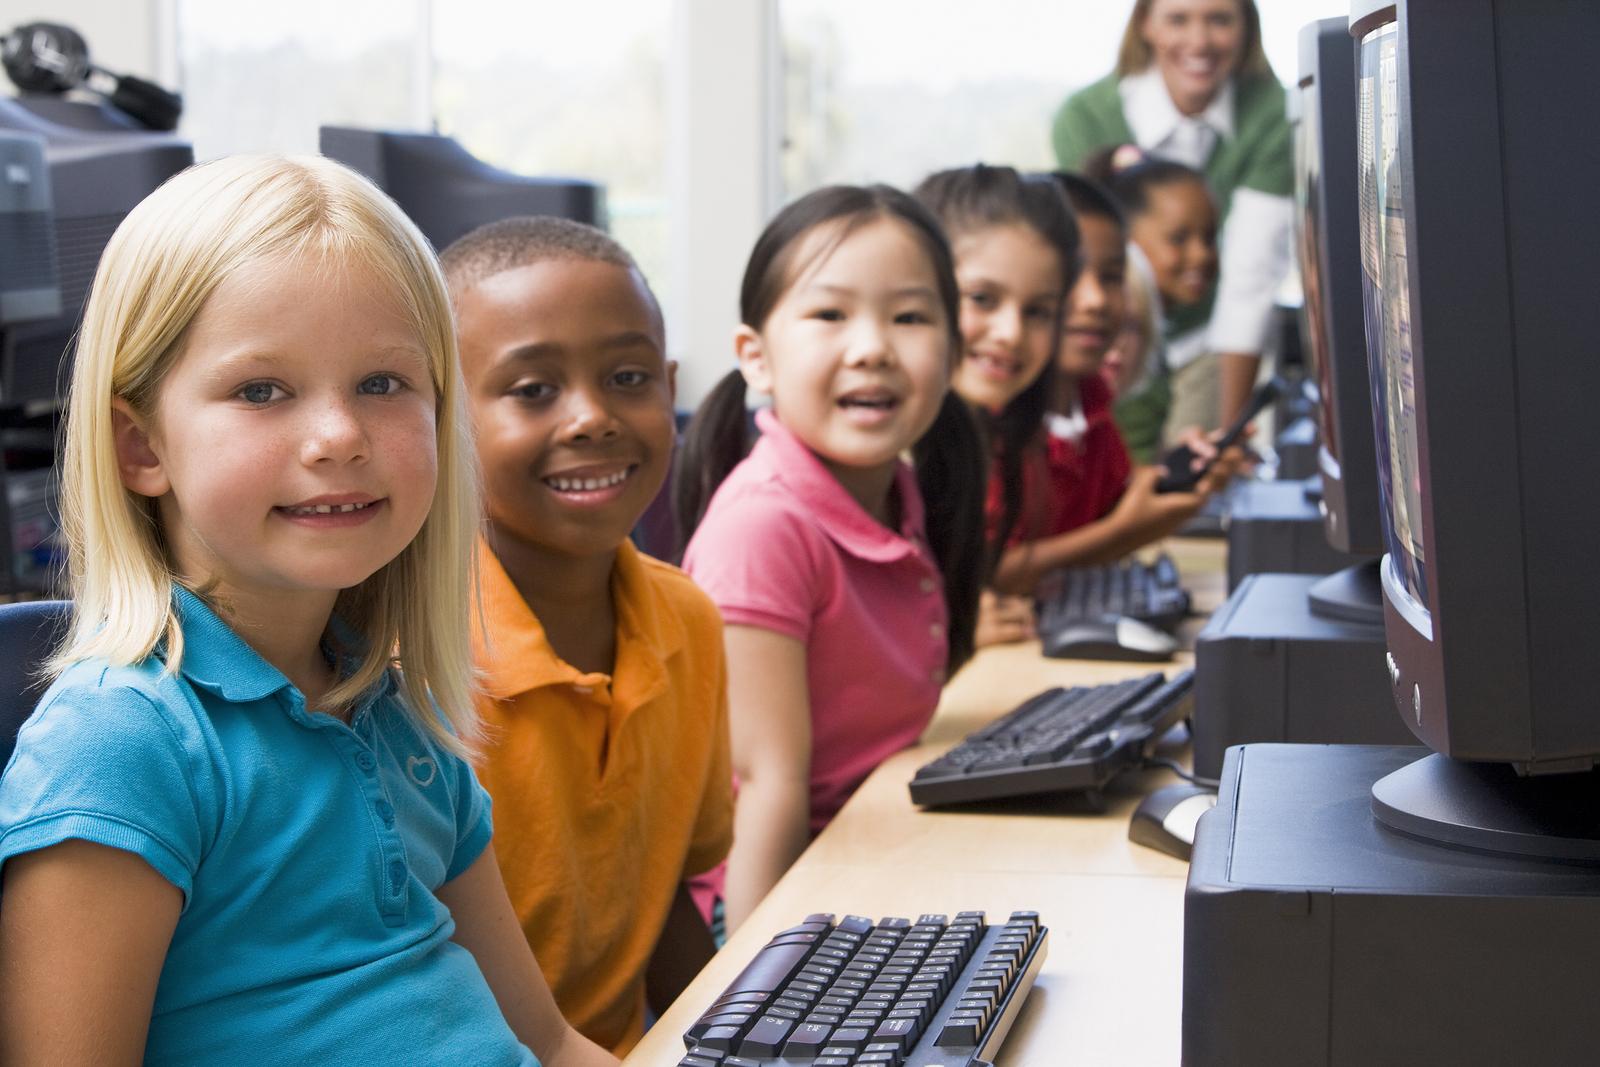 bigstock-Children-At-Computer-Terminals-3917458